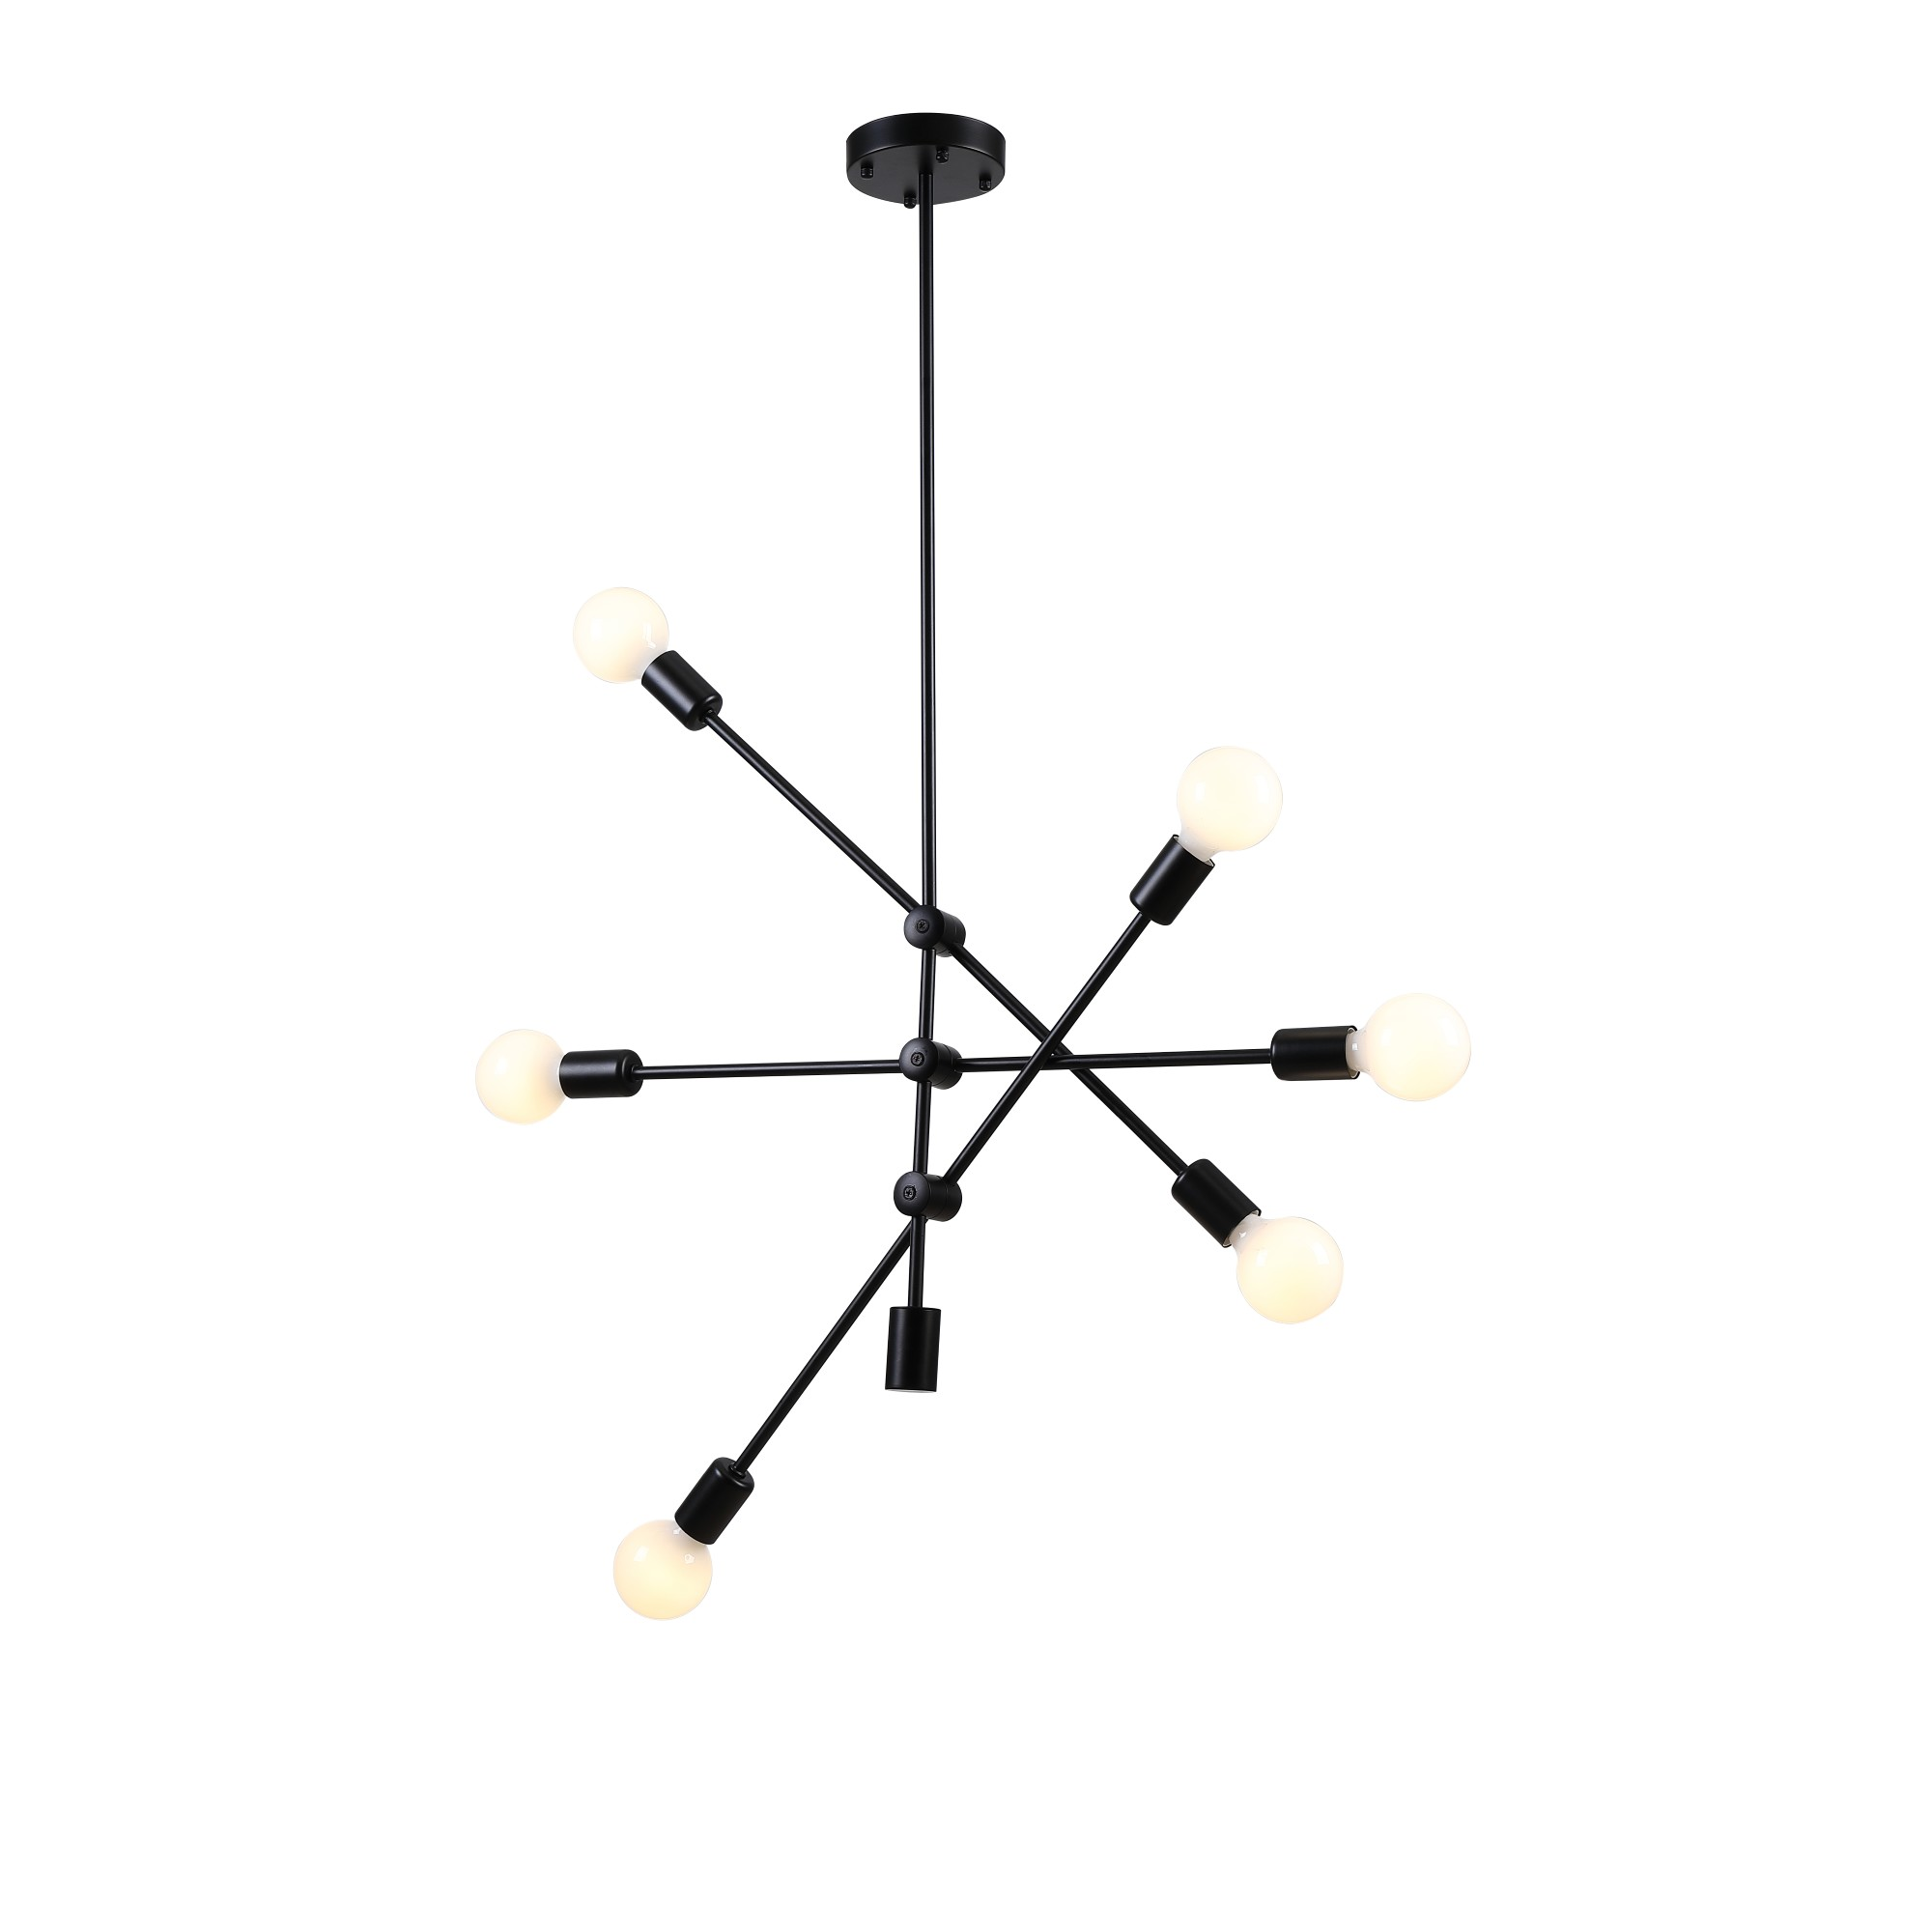 Pendente Ipanema 68 cm com 6 Lampadas Bella Iluminacao Preto - RM004B